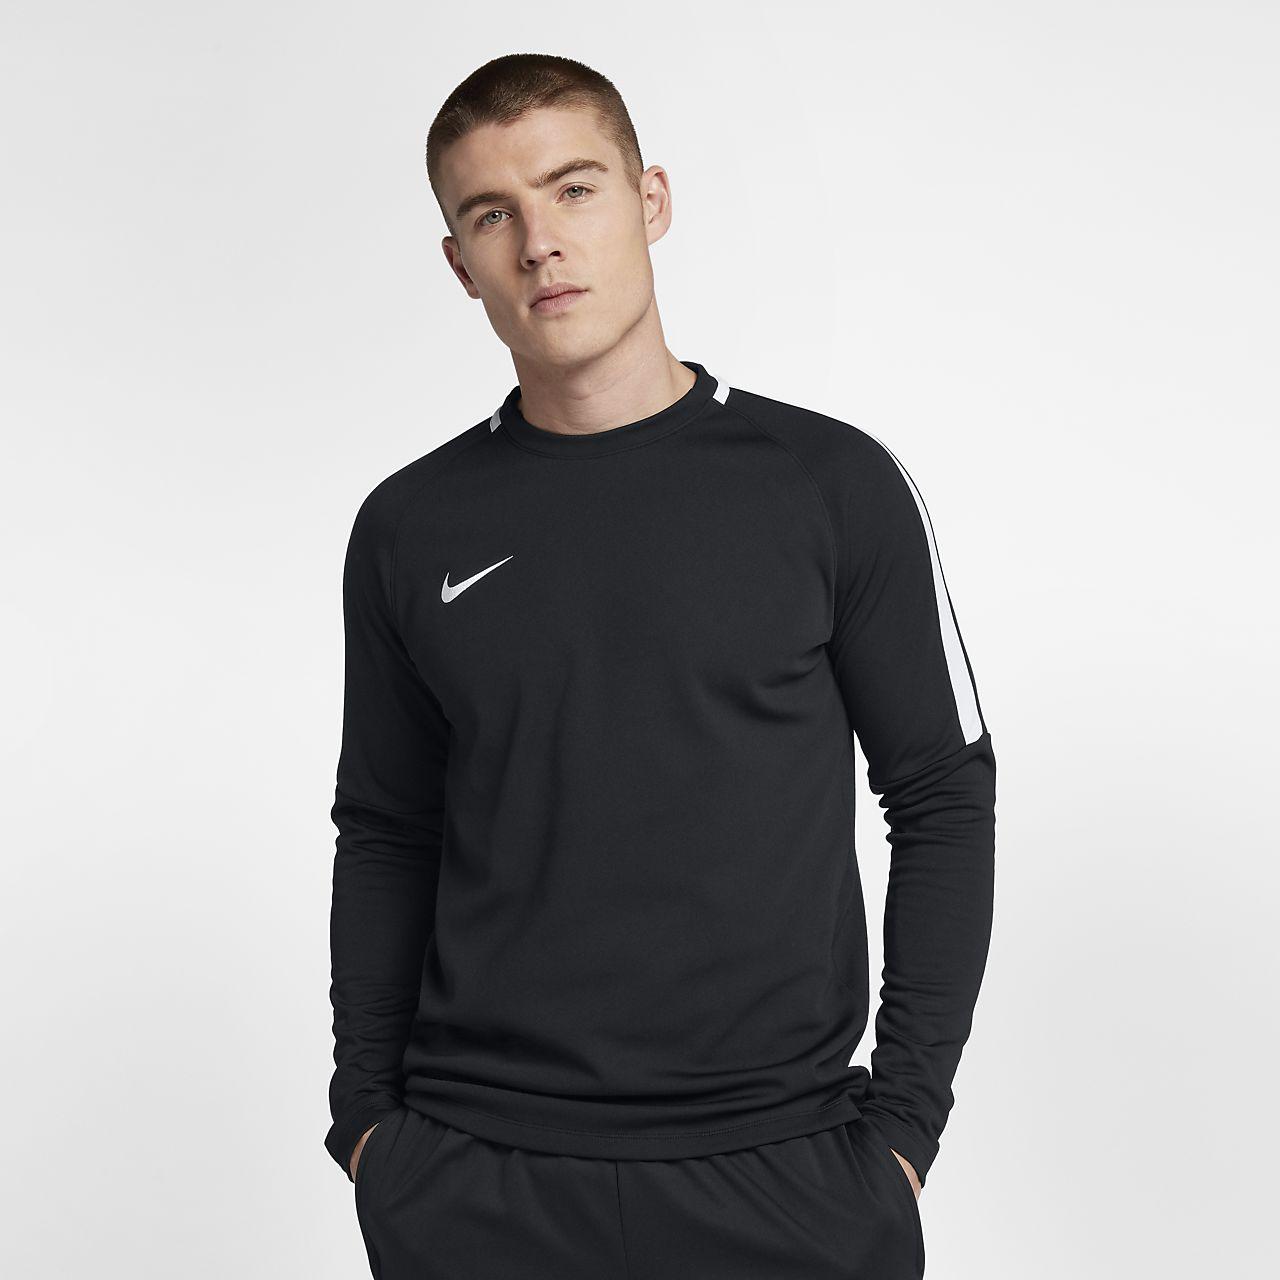 Pour De Homme Nike Fit Football Academy Dri Shirt Sweat Ch pPq0w0